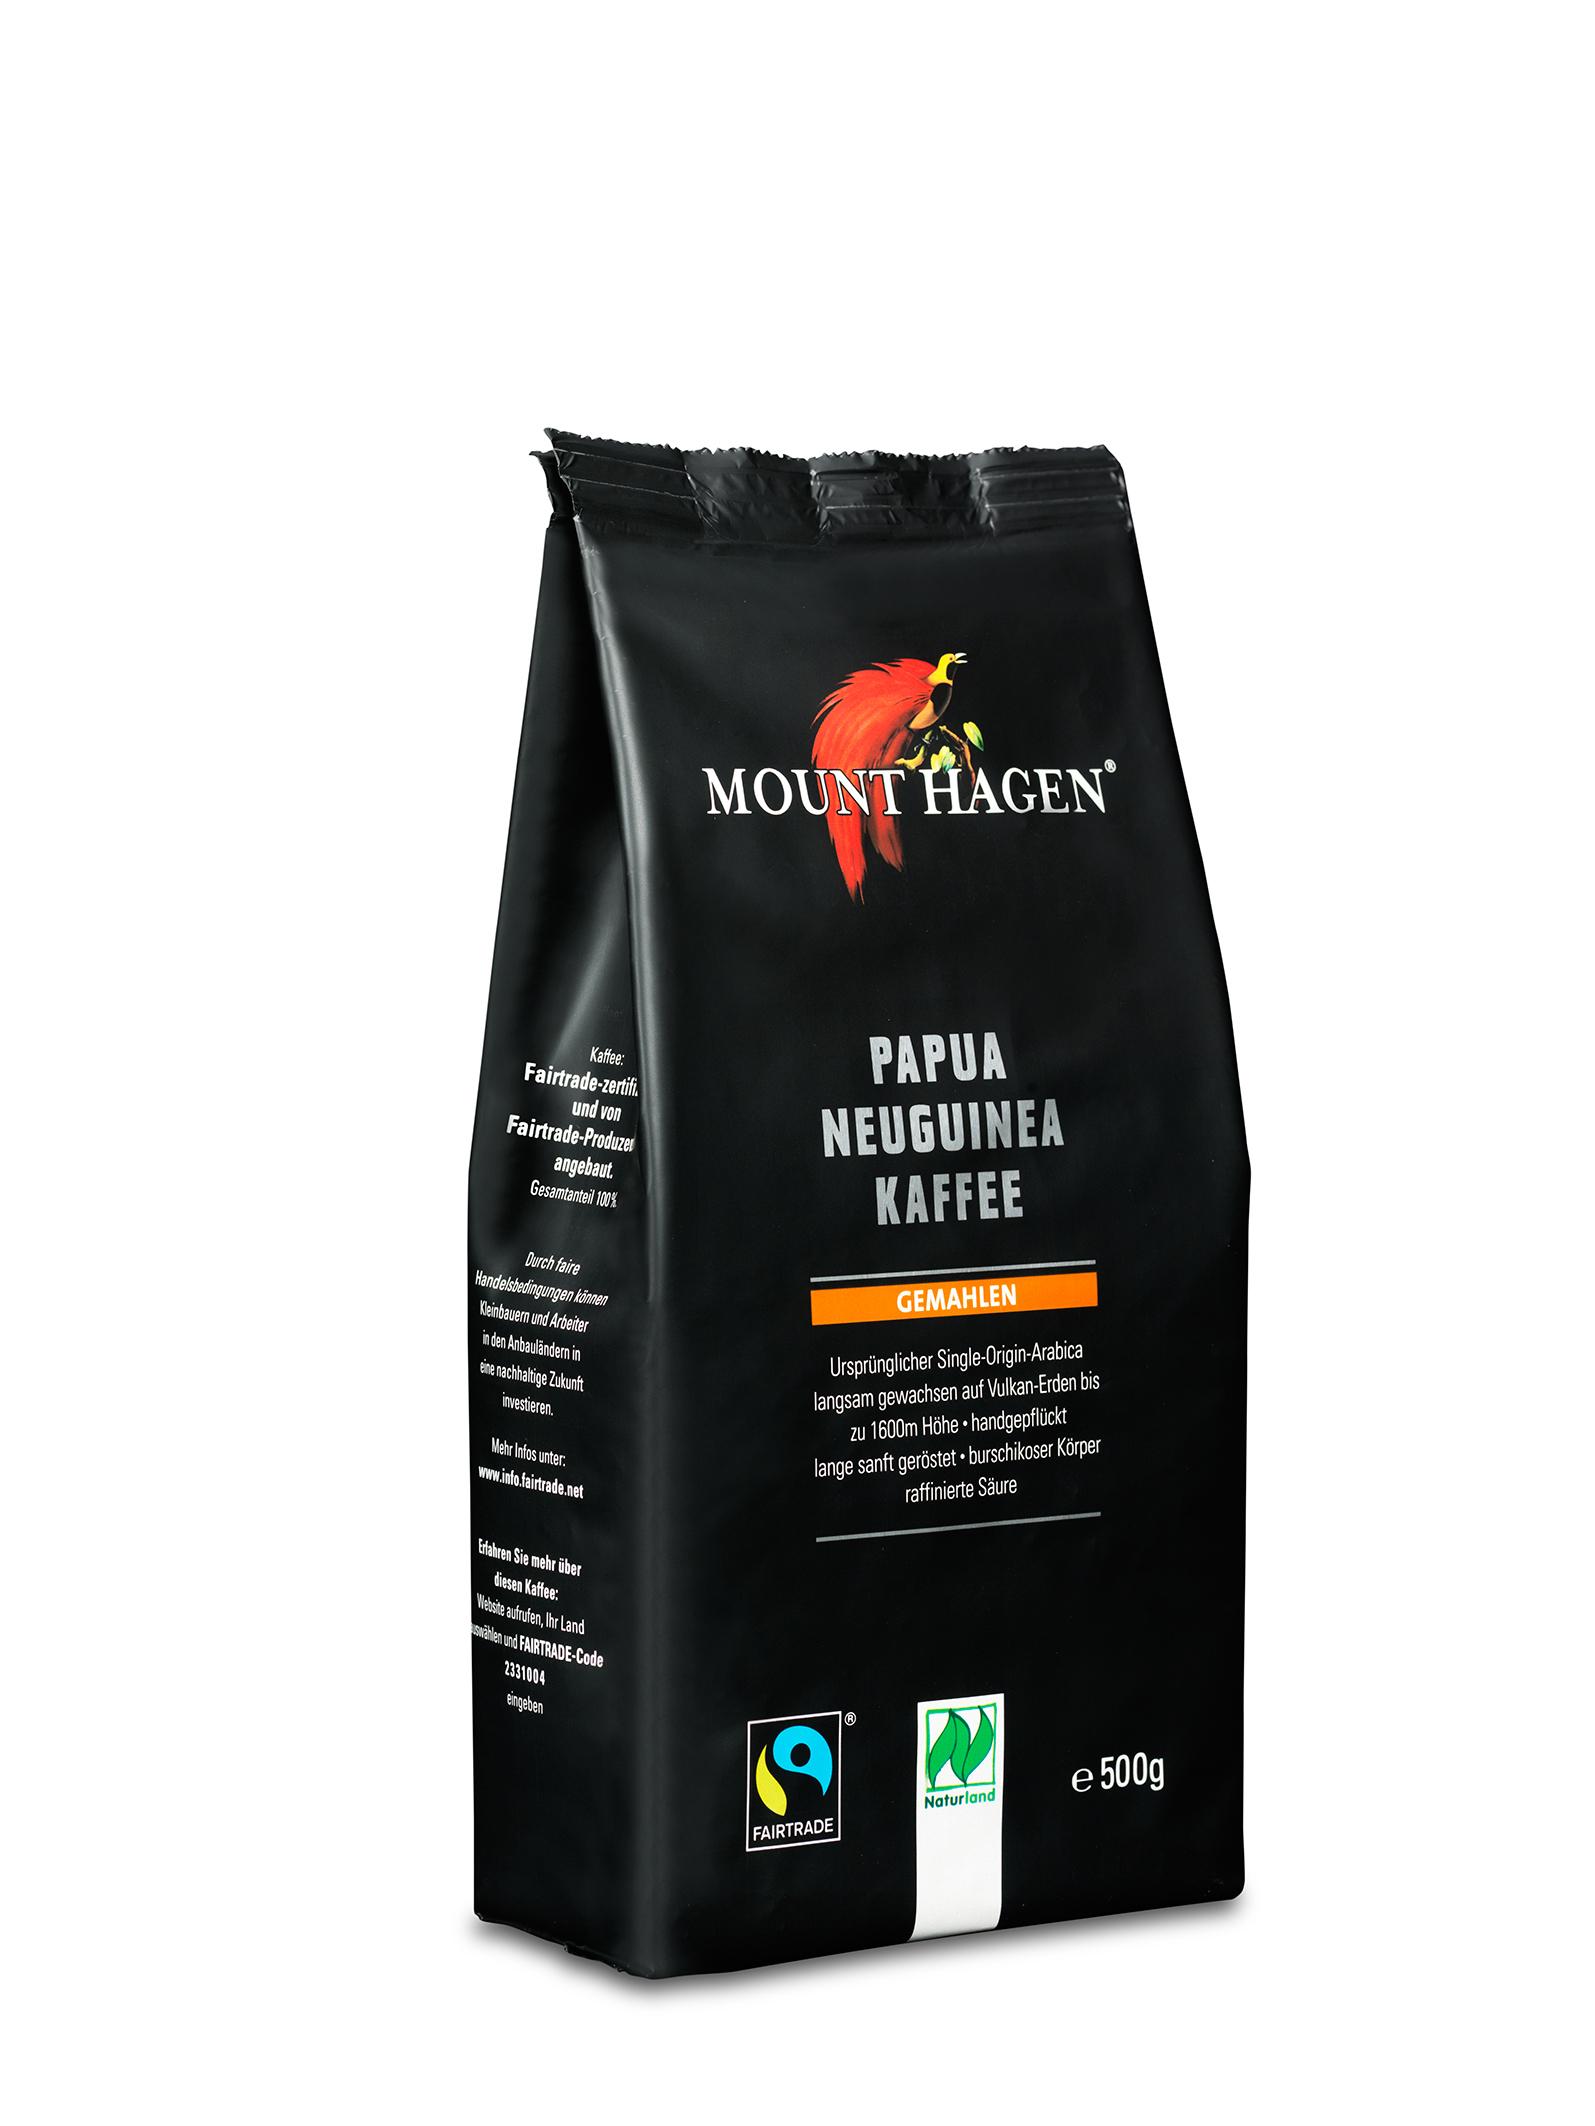 Papua Neuguinea Röstkaffee, gemahlen